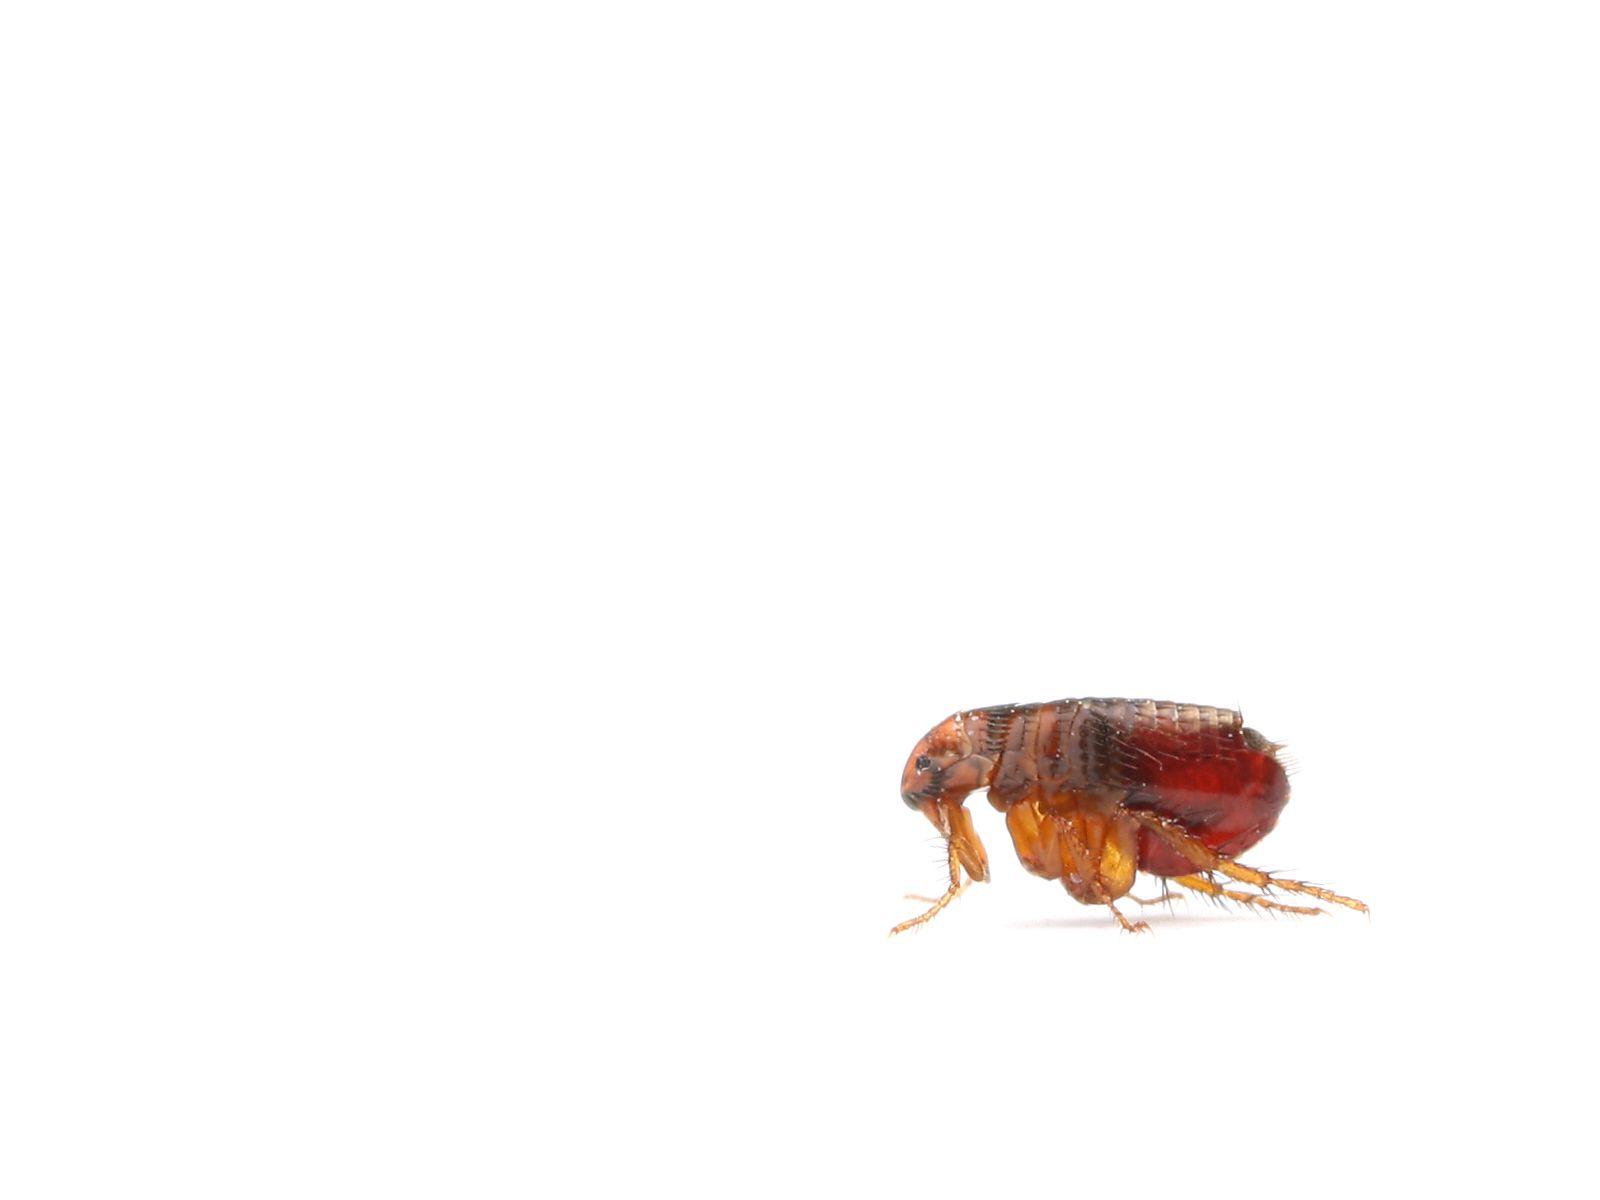 Primer plano de pulgas.